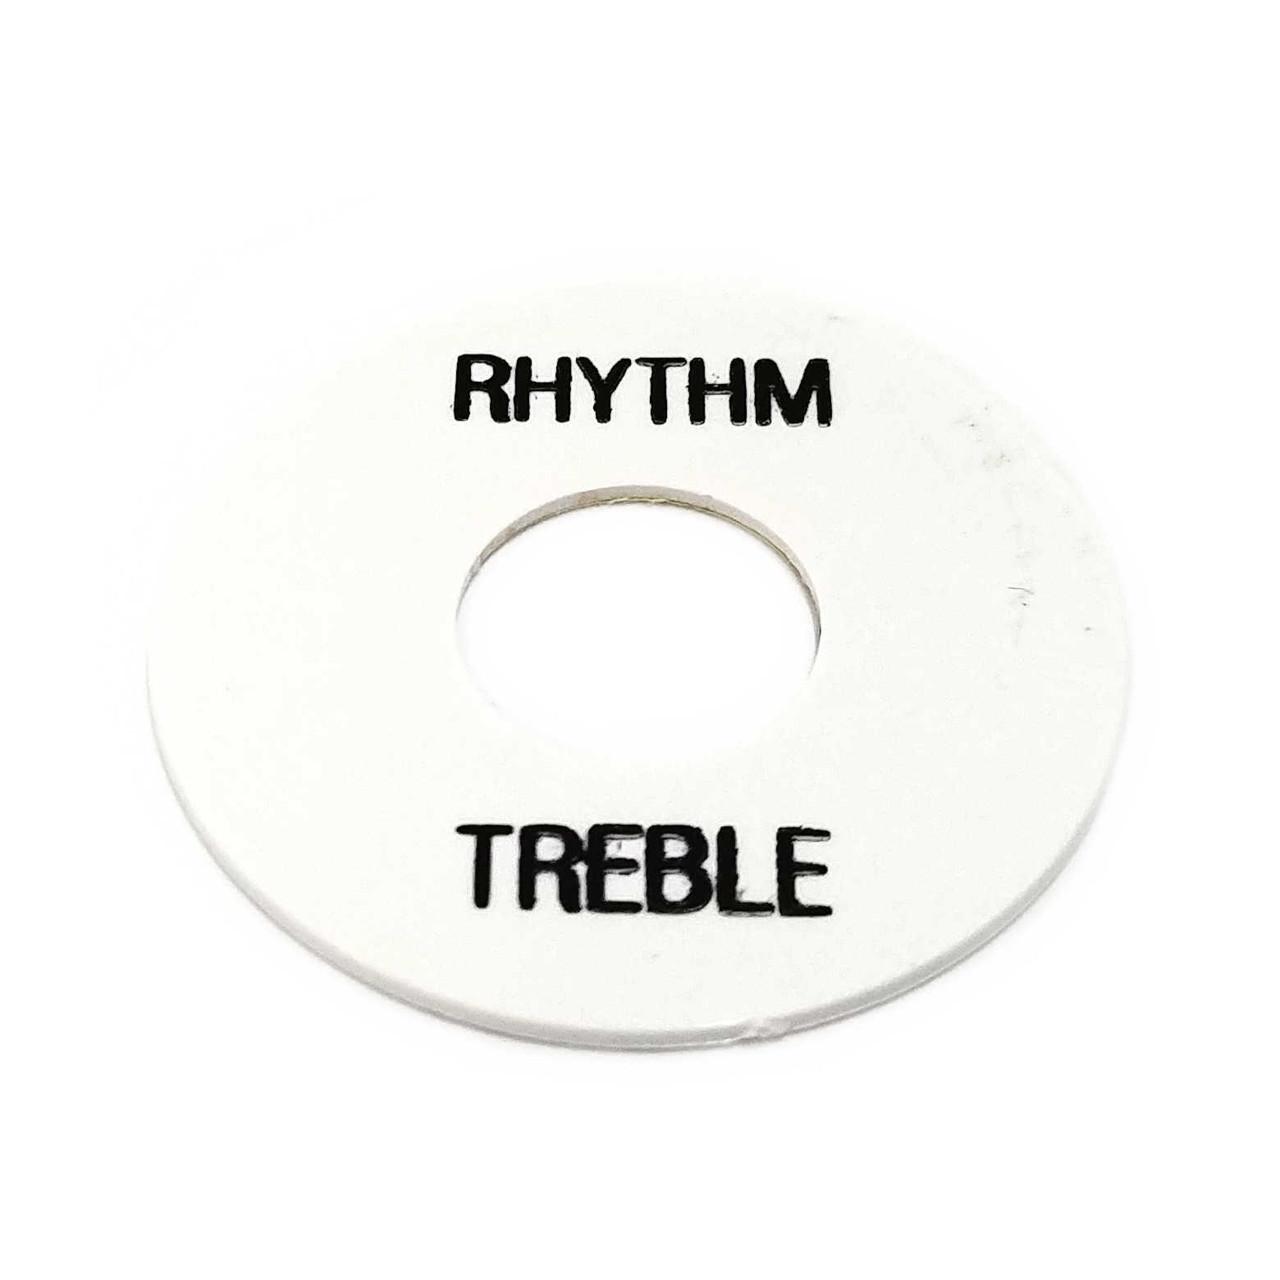 Rhythm/Treble Ring - White /w Black Letters